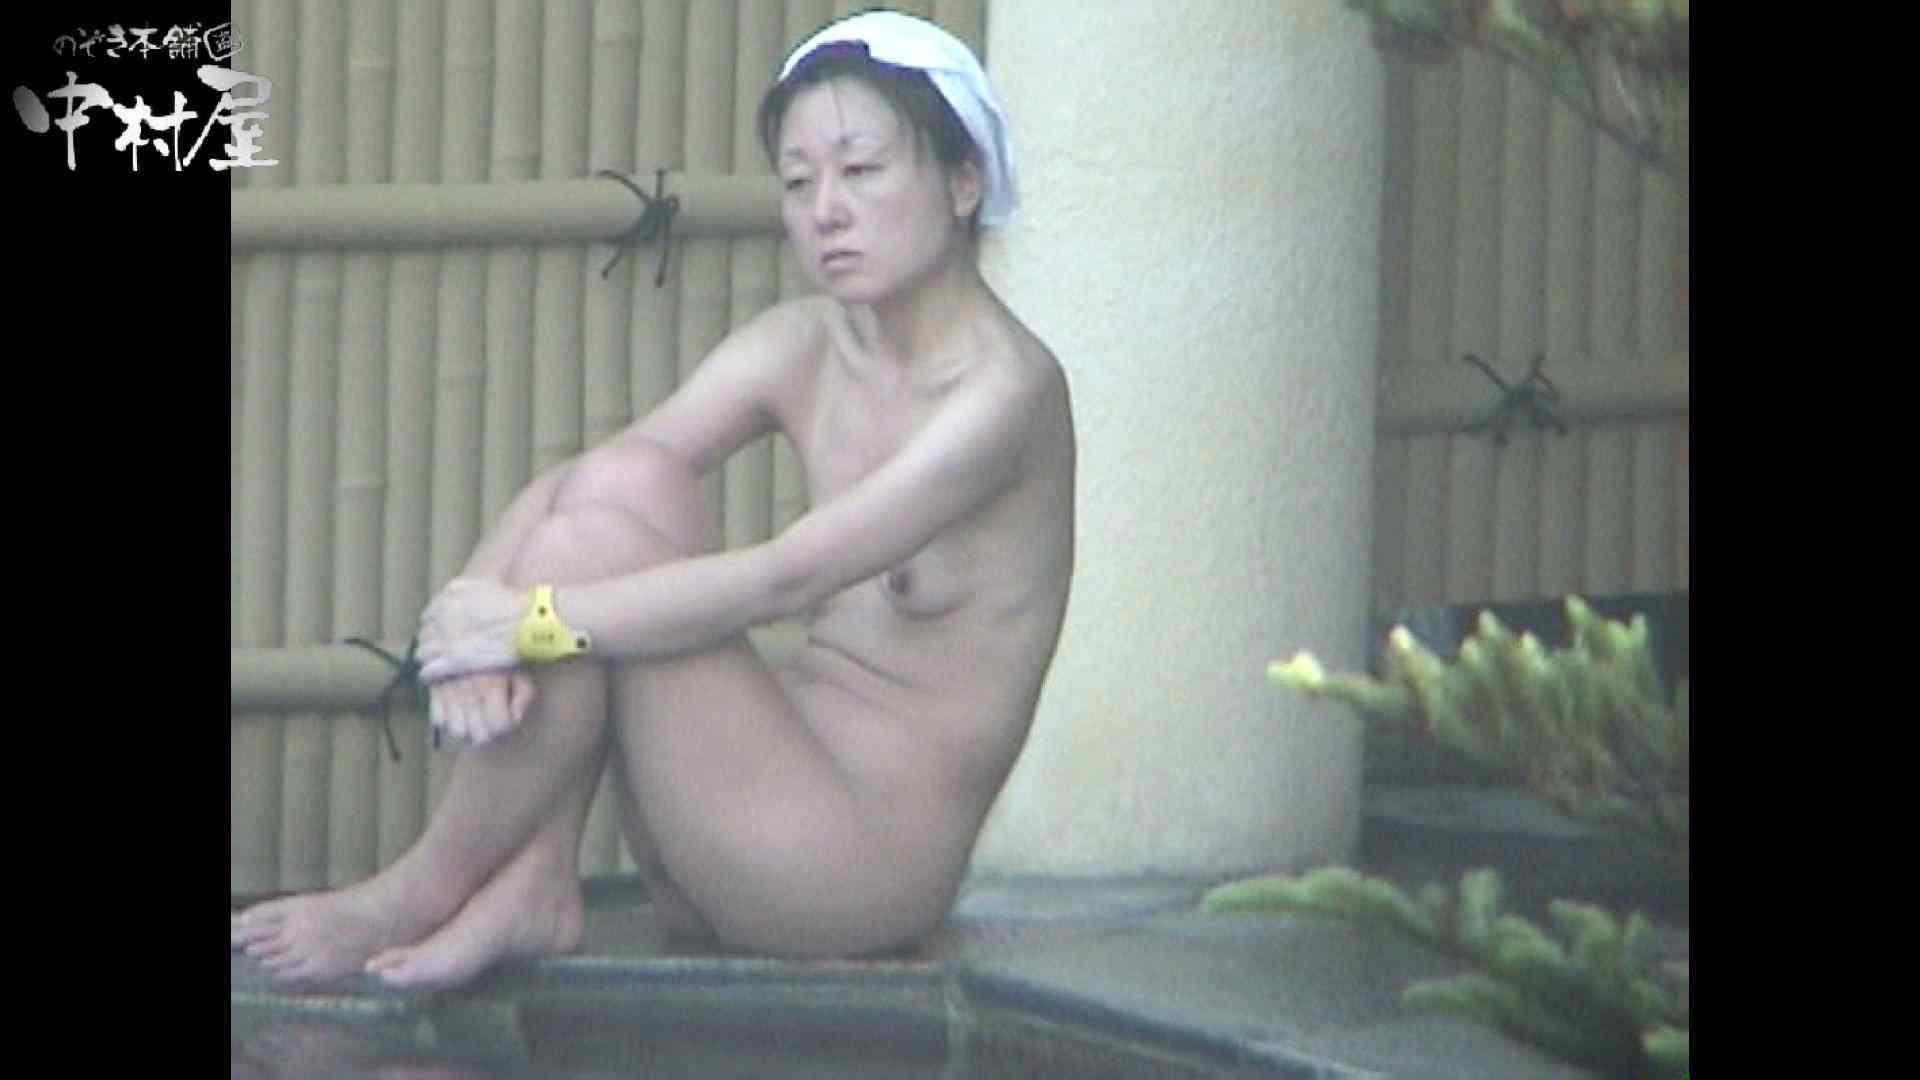 Aquaな露天風呂Vol.958 0   0  40連発 25